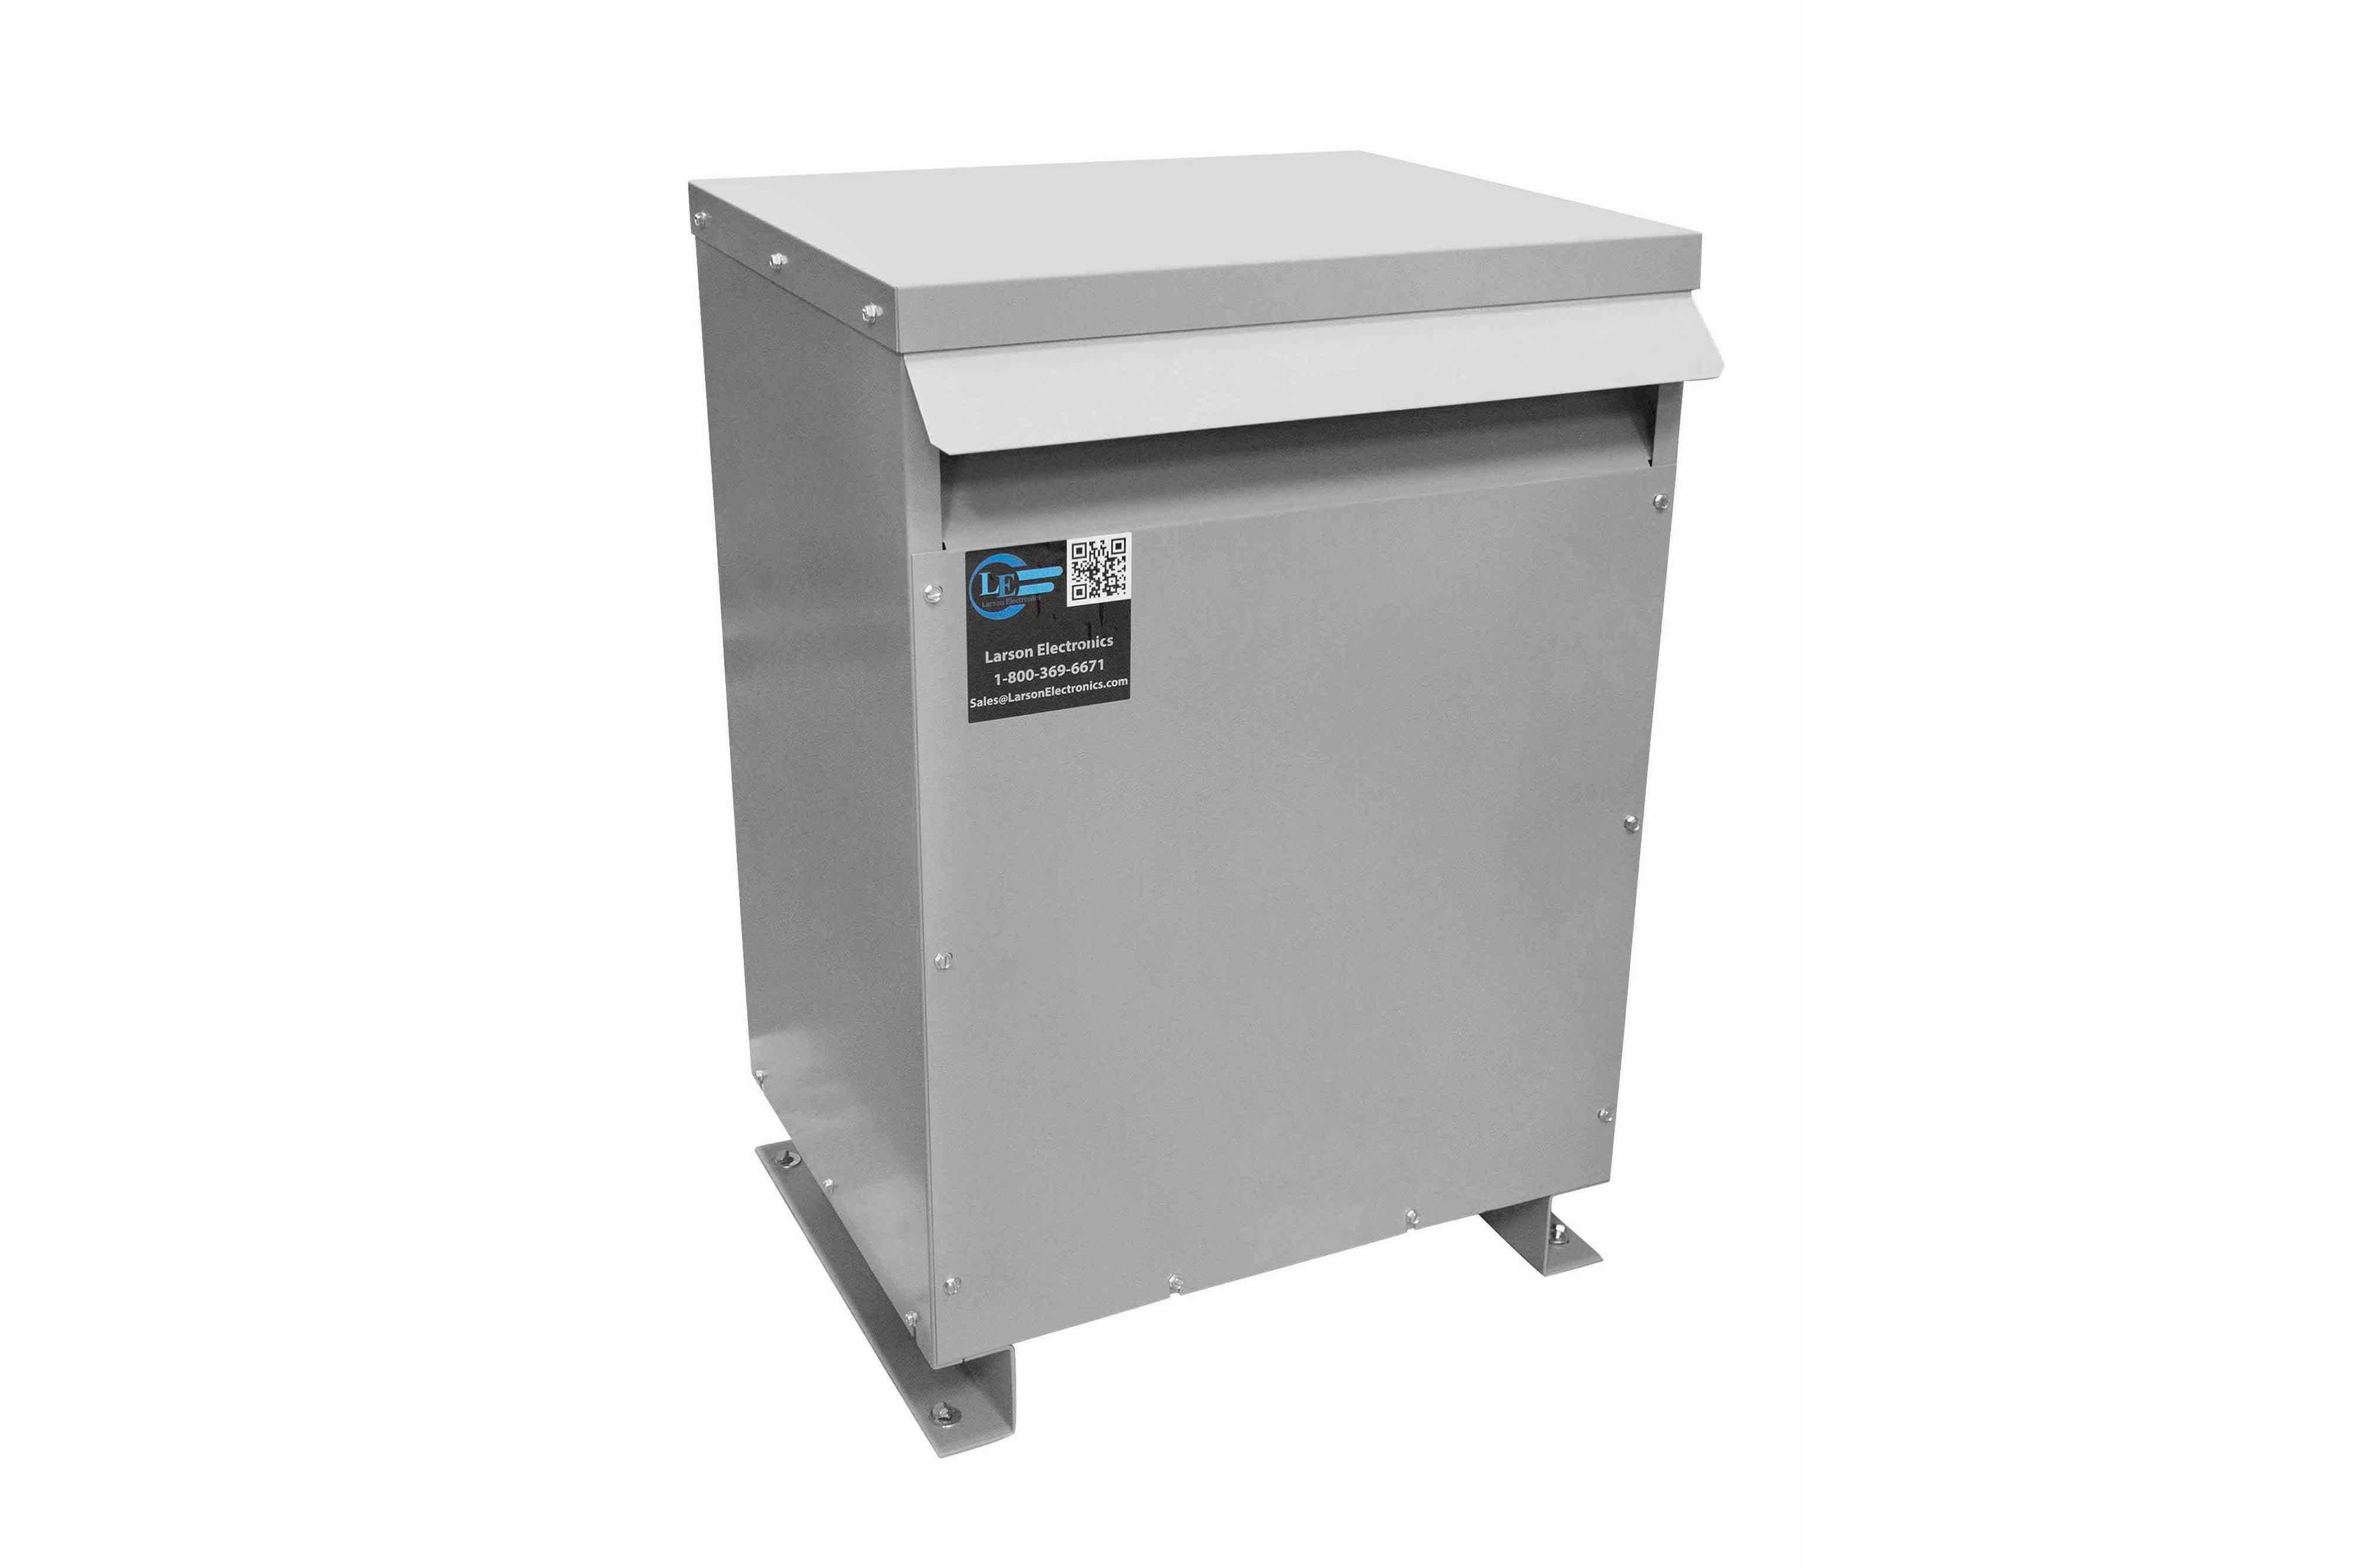 50 kVA 3PH Isolation Transformer, 400V Wye Primary, 208V Delta Secondary, N3R, Ventilated, 60 Hz